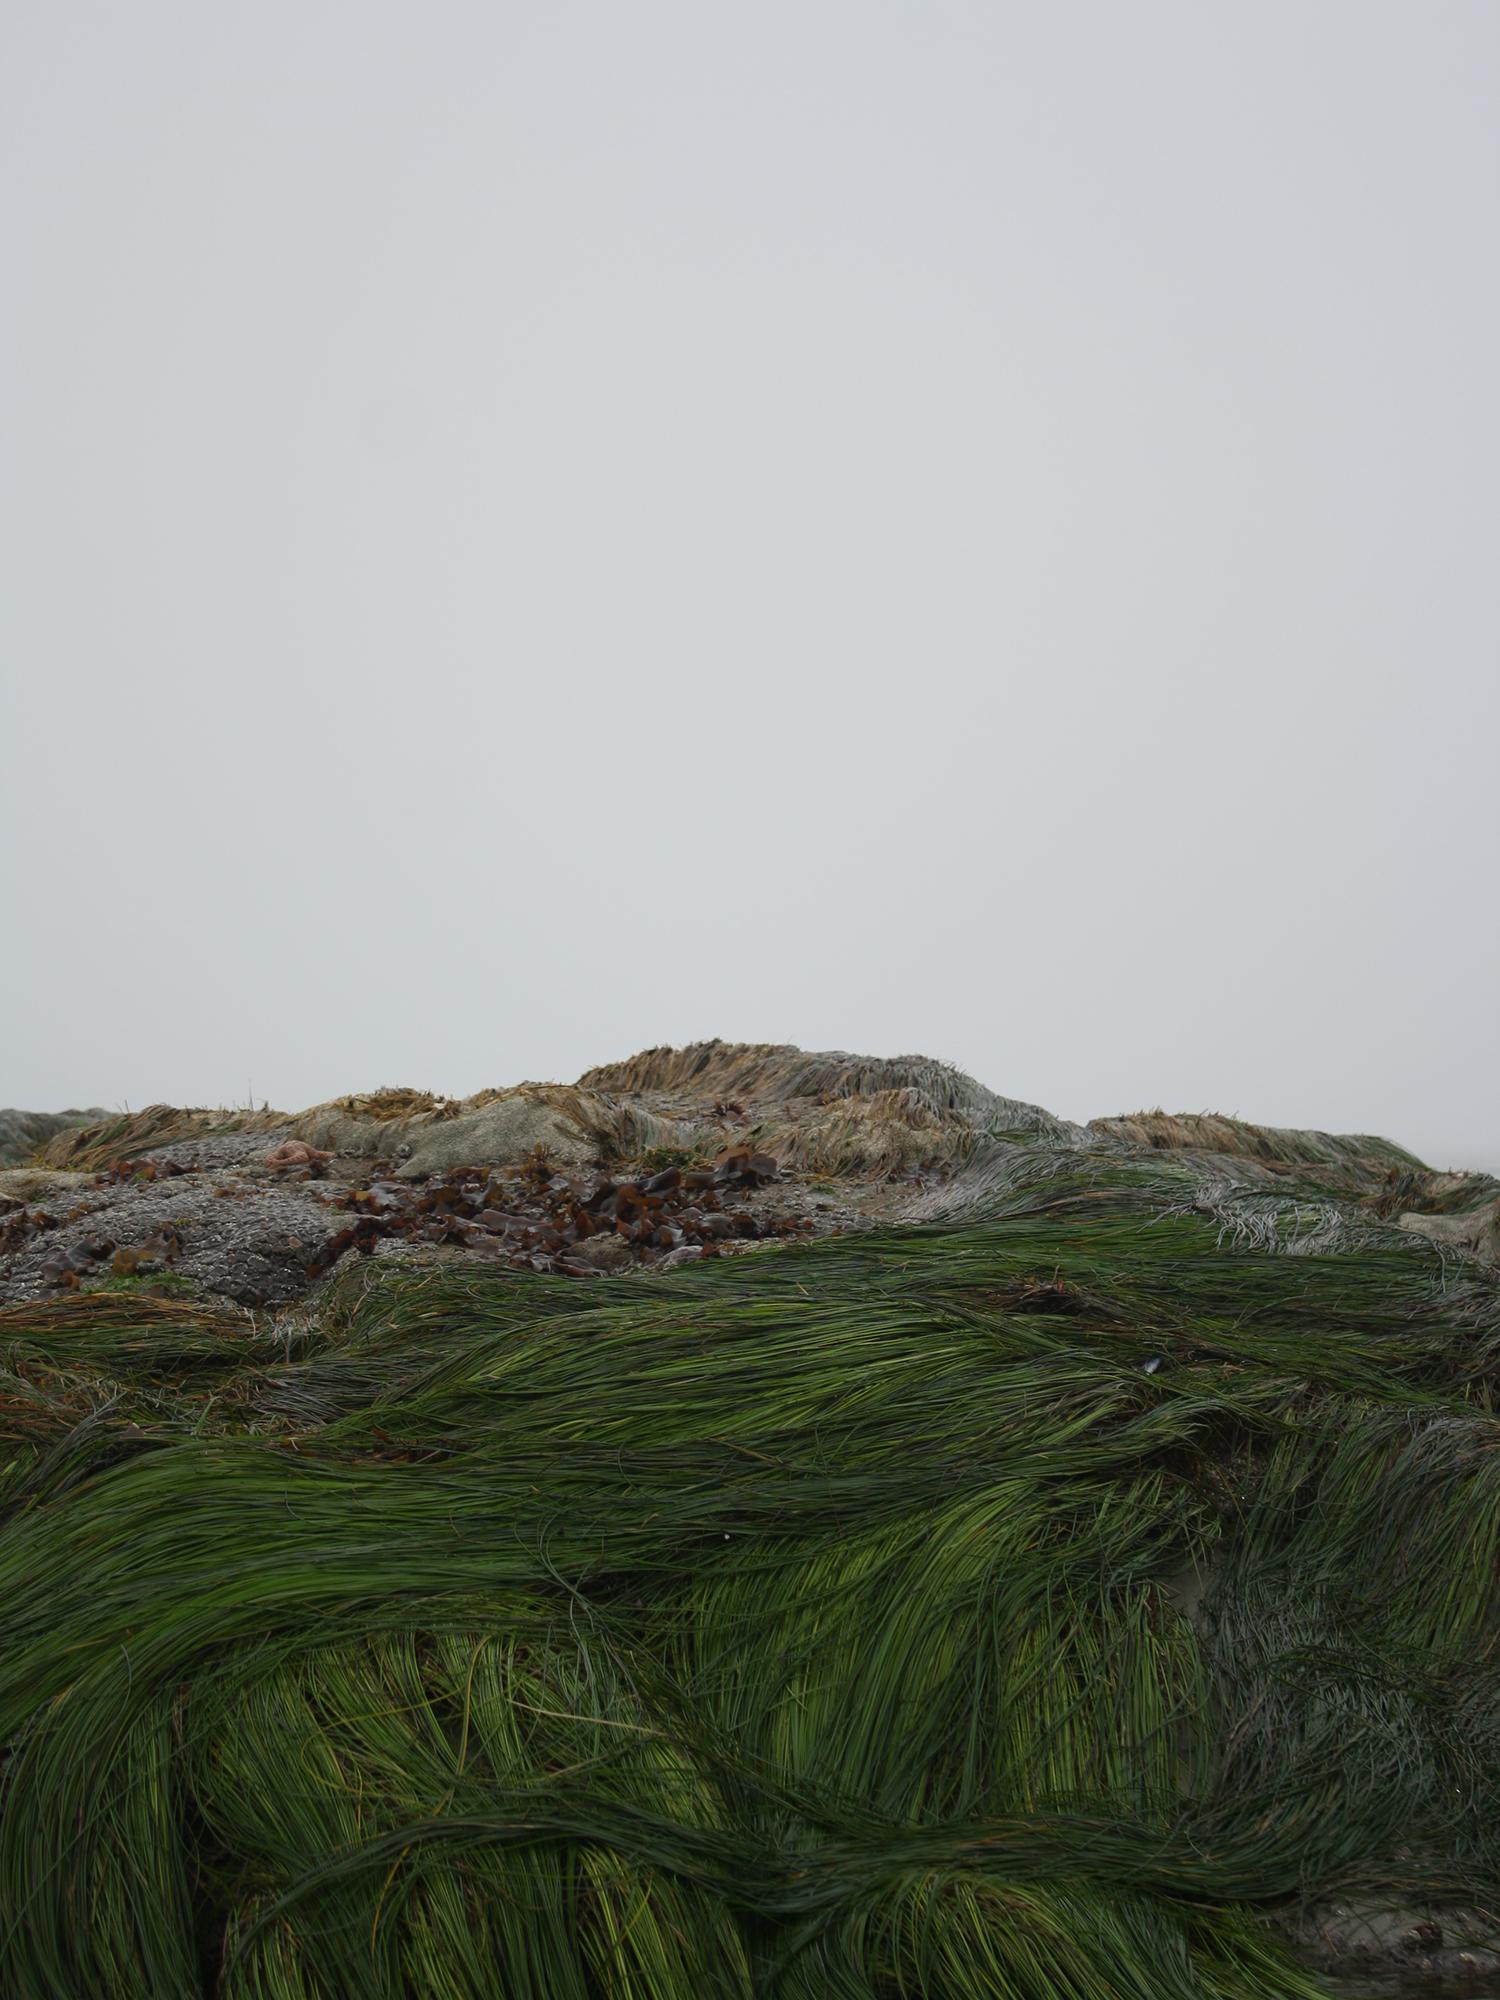 Seaweed on the rocks at the MacKenzie Beach in Tofino, BC, Canada